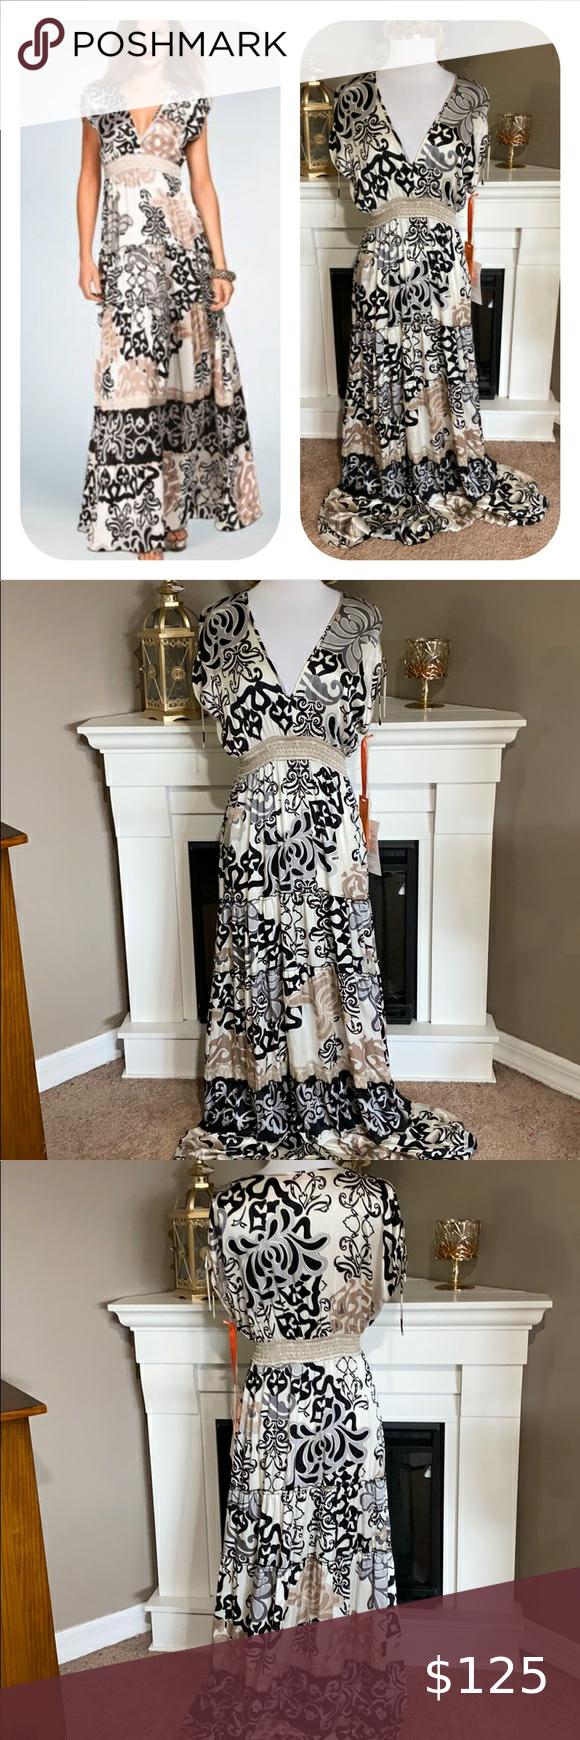 Hale Bob Cabana Stretch Silk Maxi Dress Ivory Black Gray And Taupe Stretch Silk Maxi With Subtle Shoulde Silk Maxi Dress Gauze Maxi Dress Hale Bob Dresses [ 1740 x 580 Pixel ]